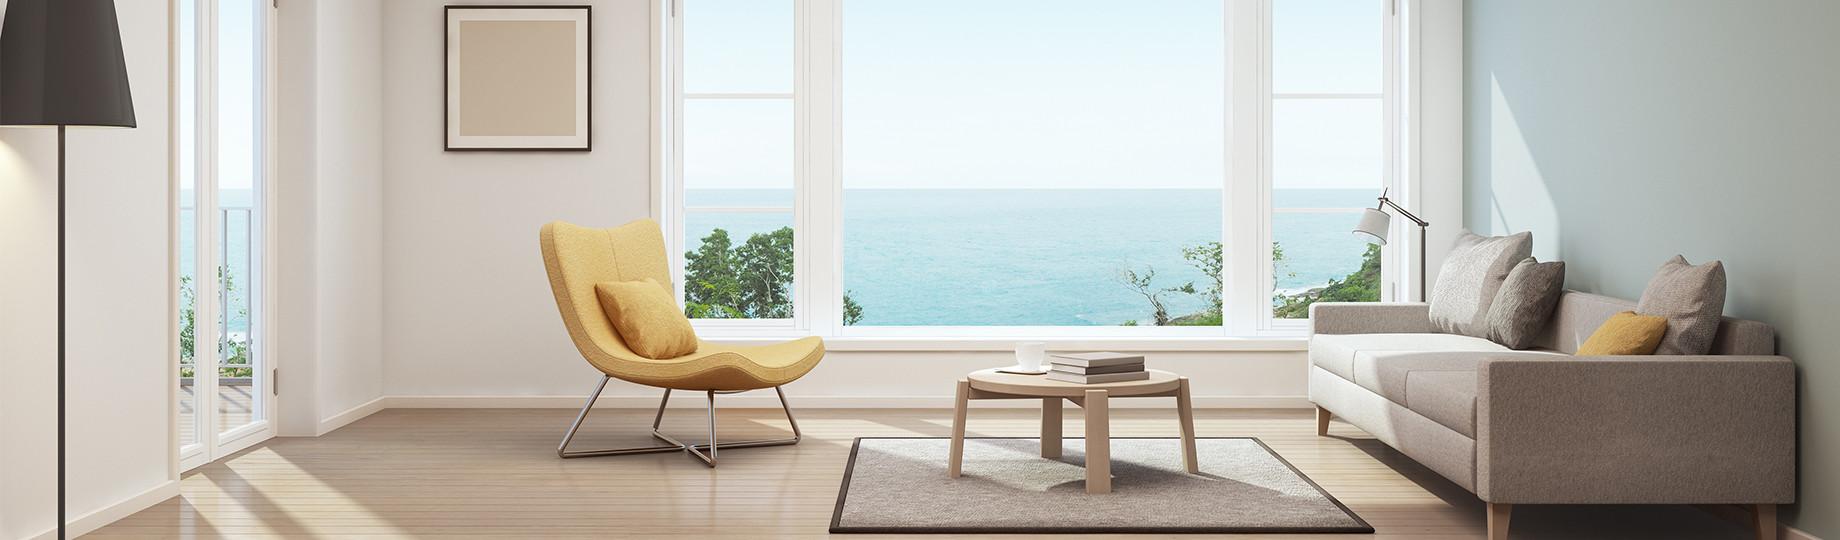 lmnp location meublee saisonniere